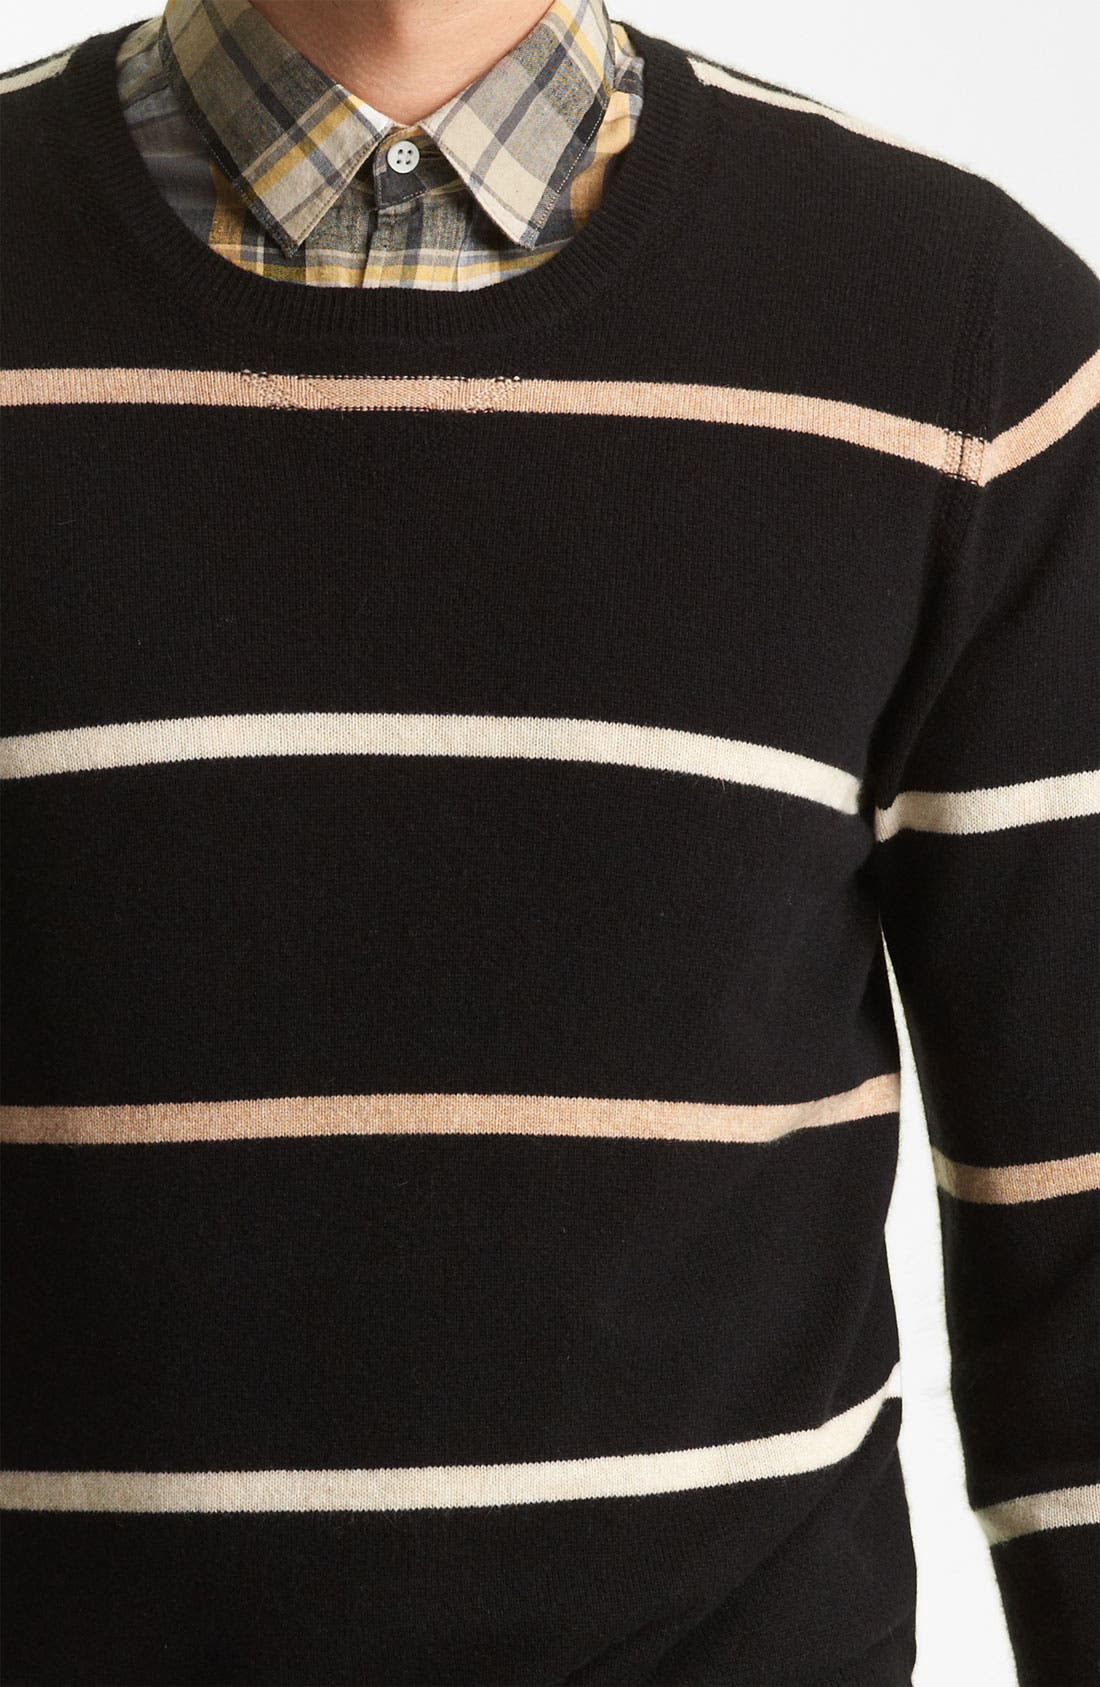 Alternate Image 3  - Shipley & Halmos 'Laurel' Cashmere Sweater